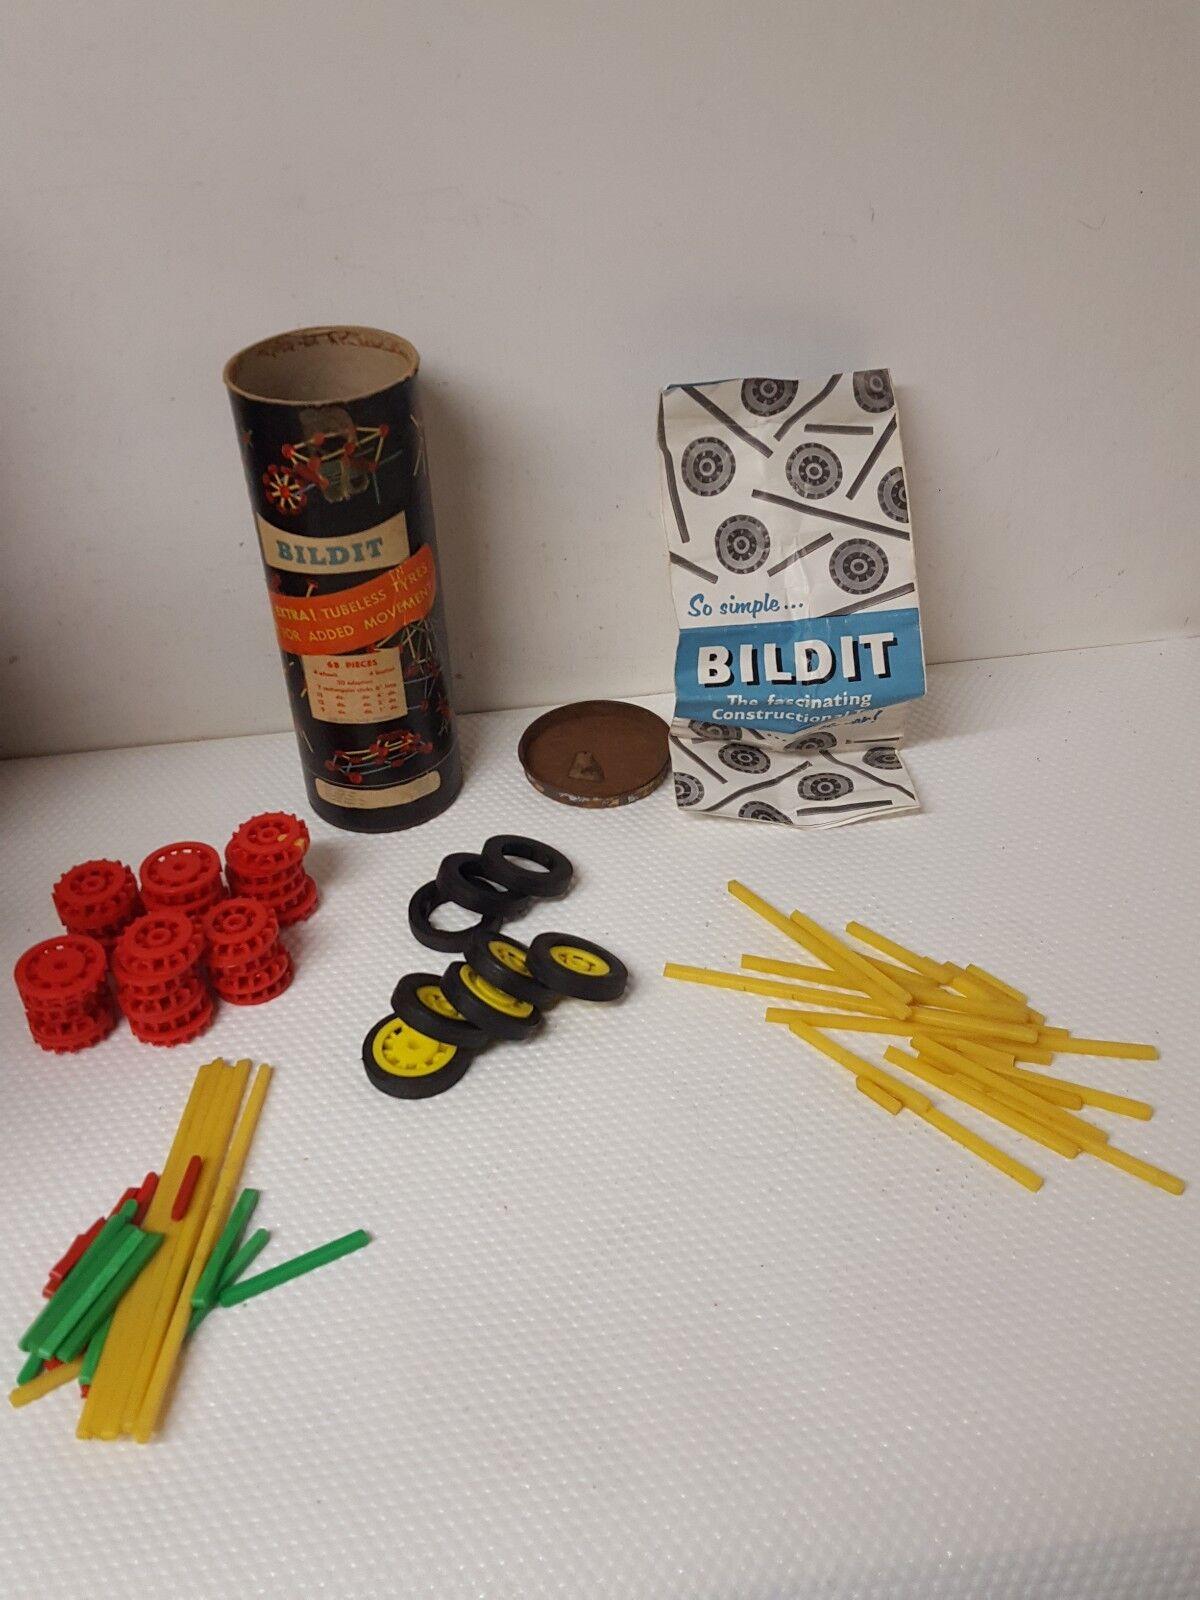 Bildit Constructional Toy by Plysu Housewares Ltd vintage Building Toy